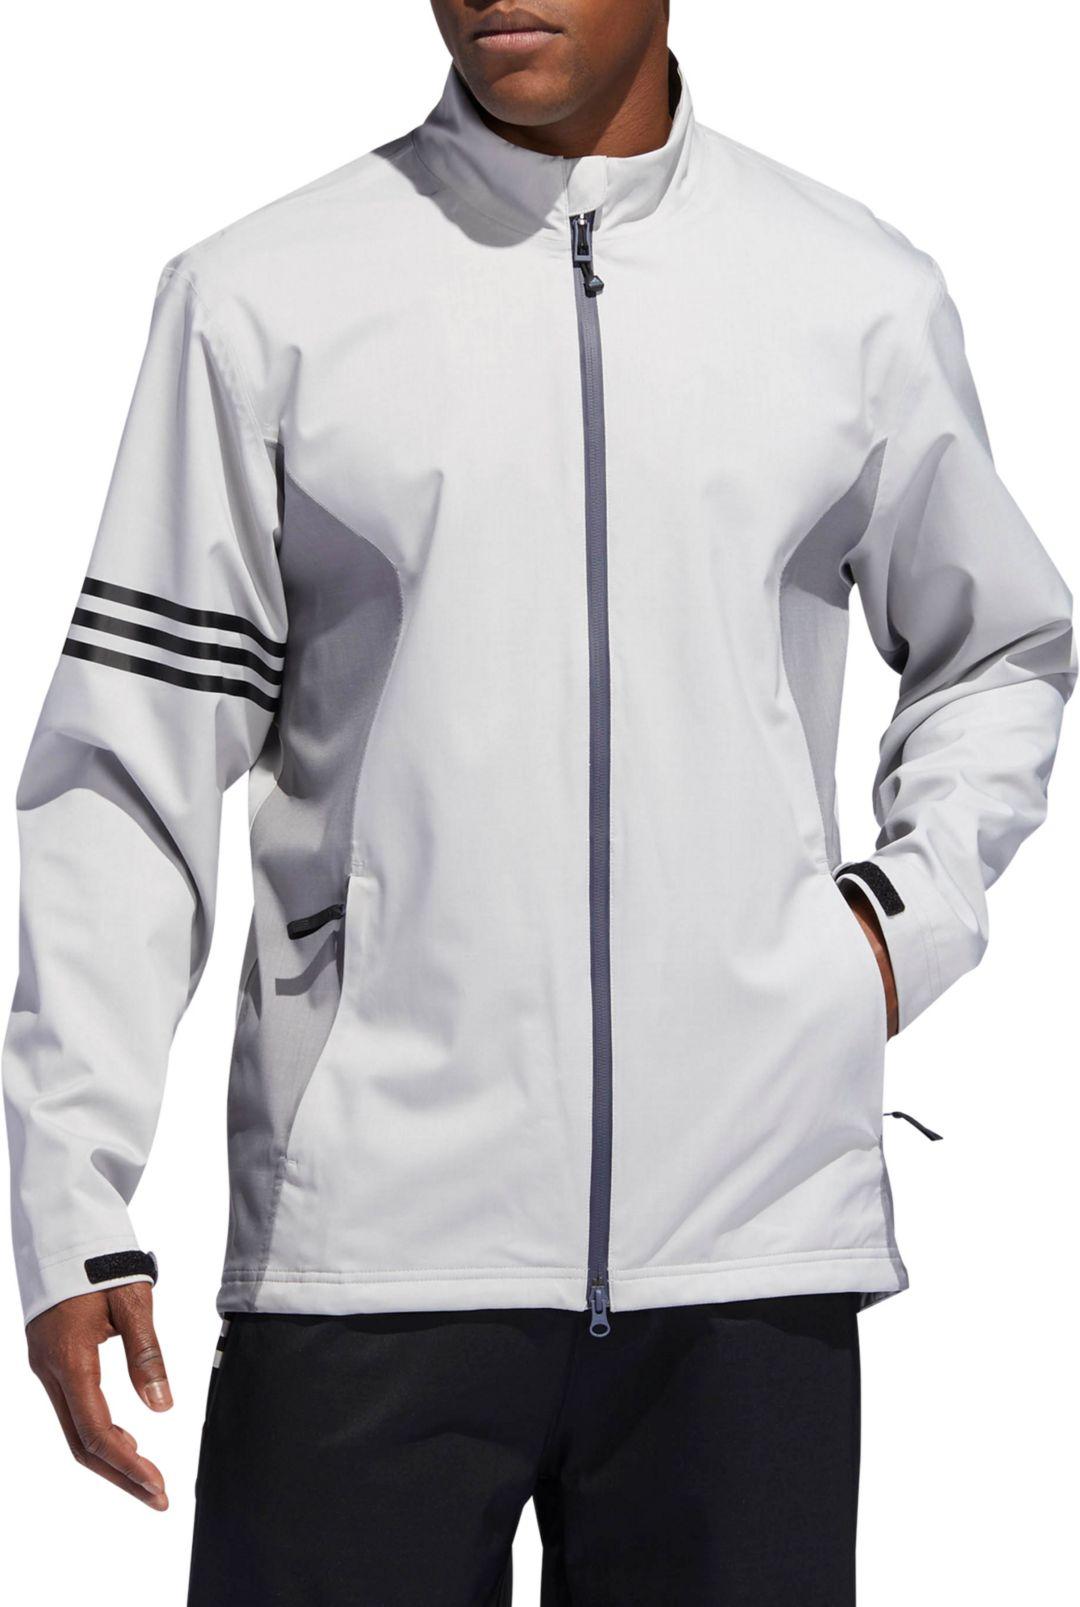 adidas Men's Climaproof Golf Rain Jacket